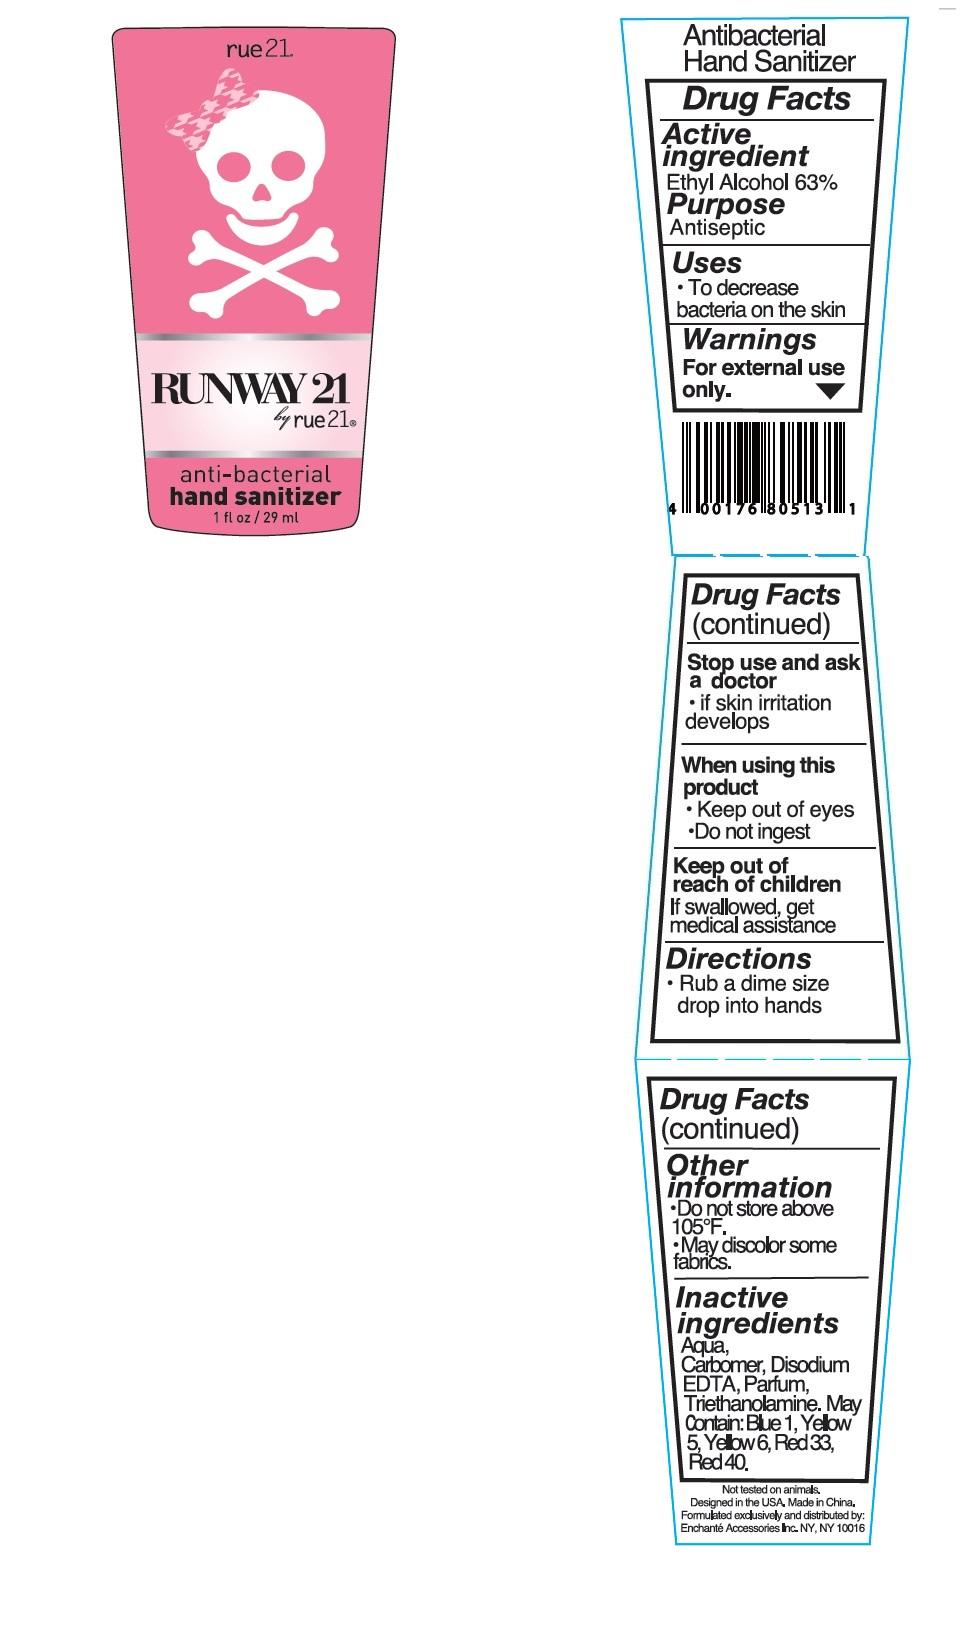 Rue21 Runway 21 Antibacterial Hand Sanitizer (Alcohol) Liquid [Enchante Accessories Inc. ]